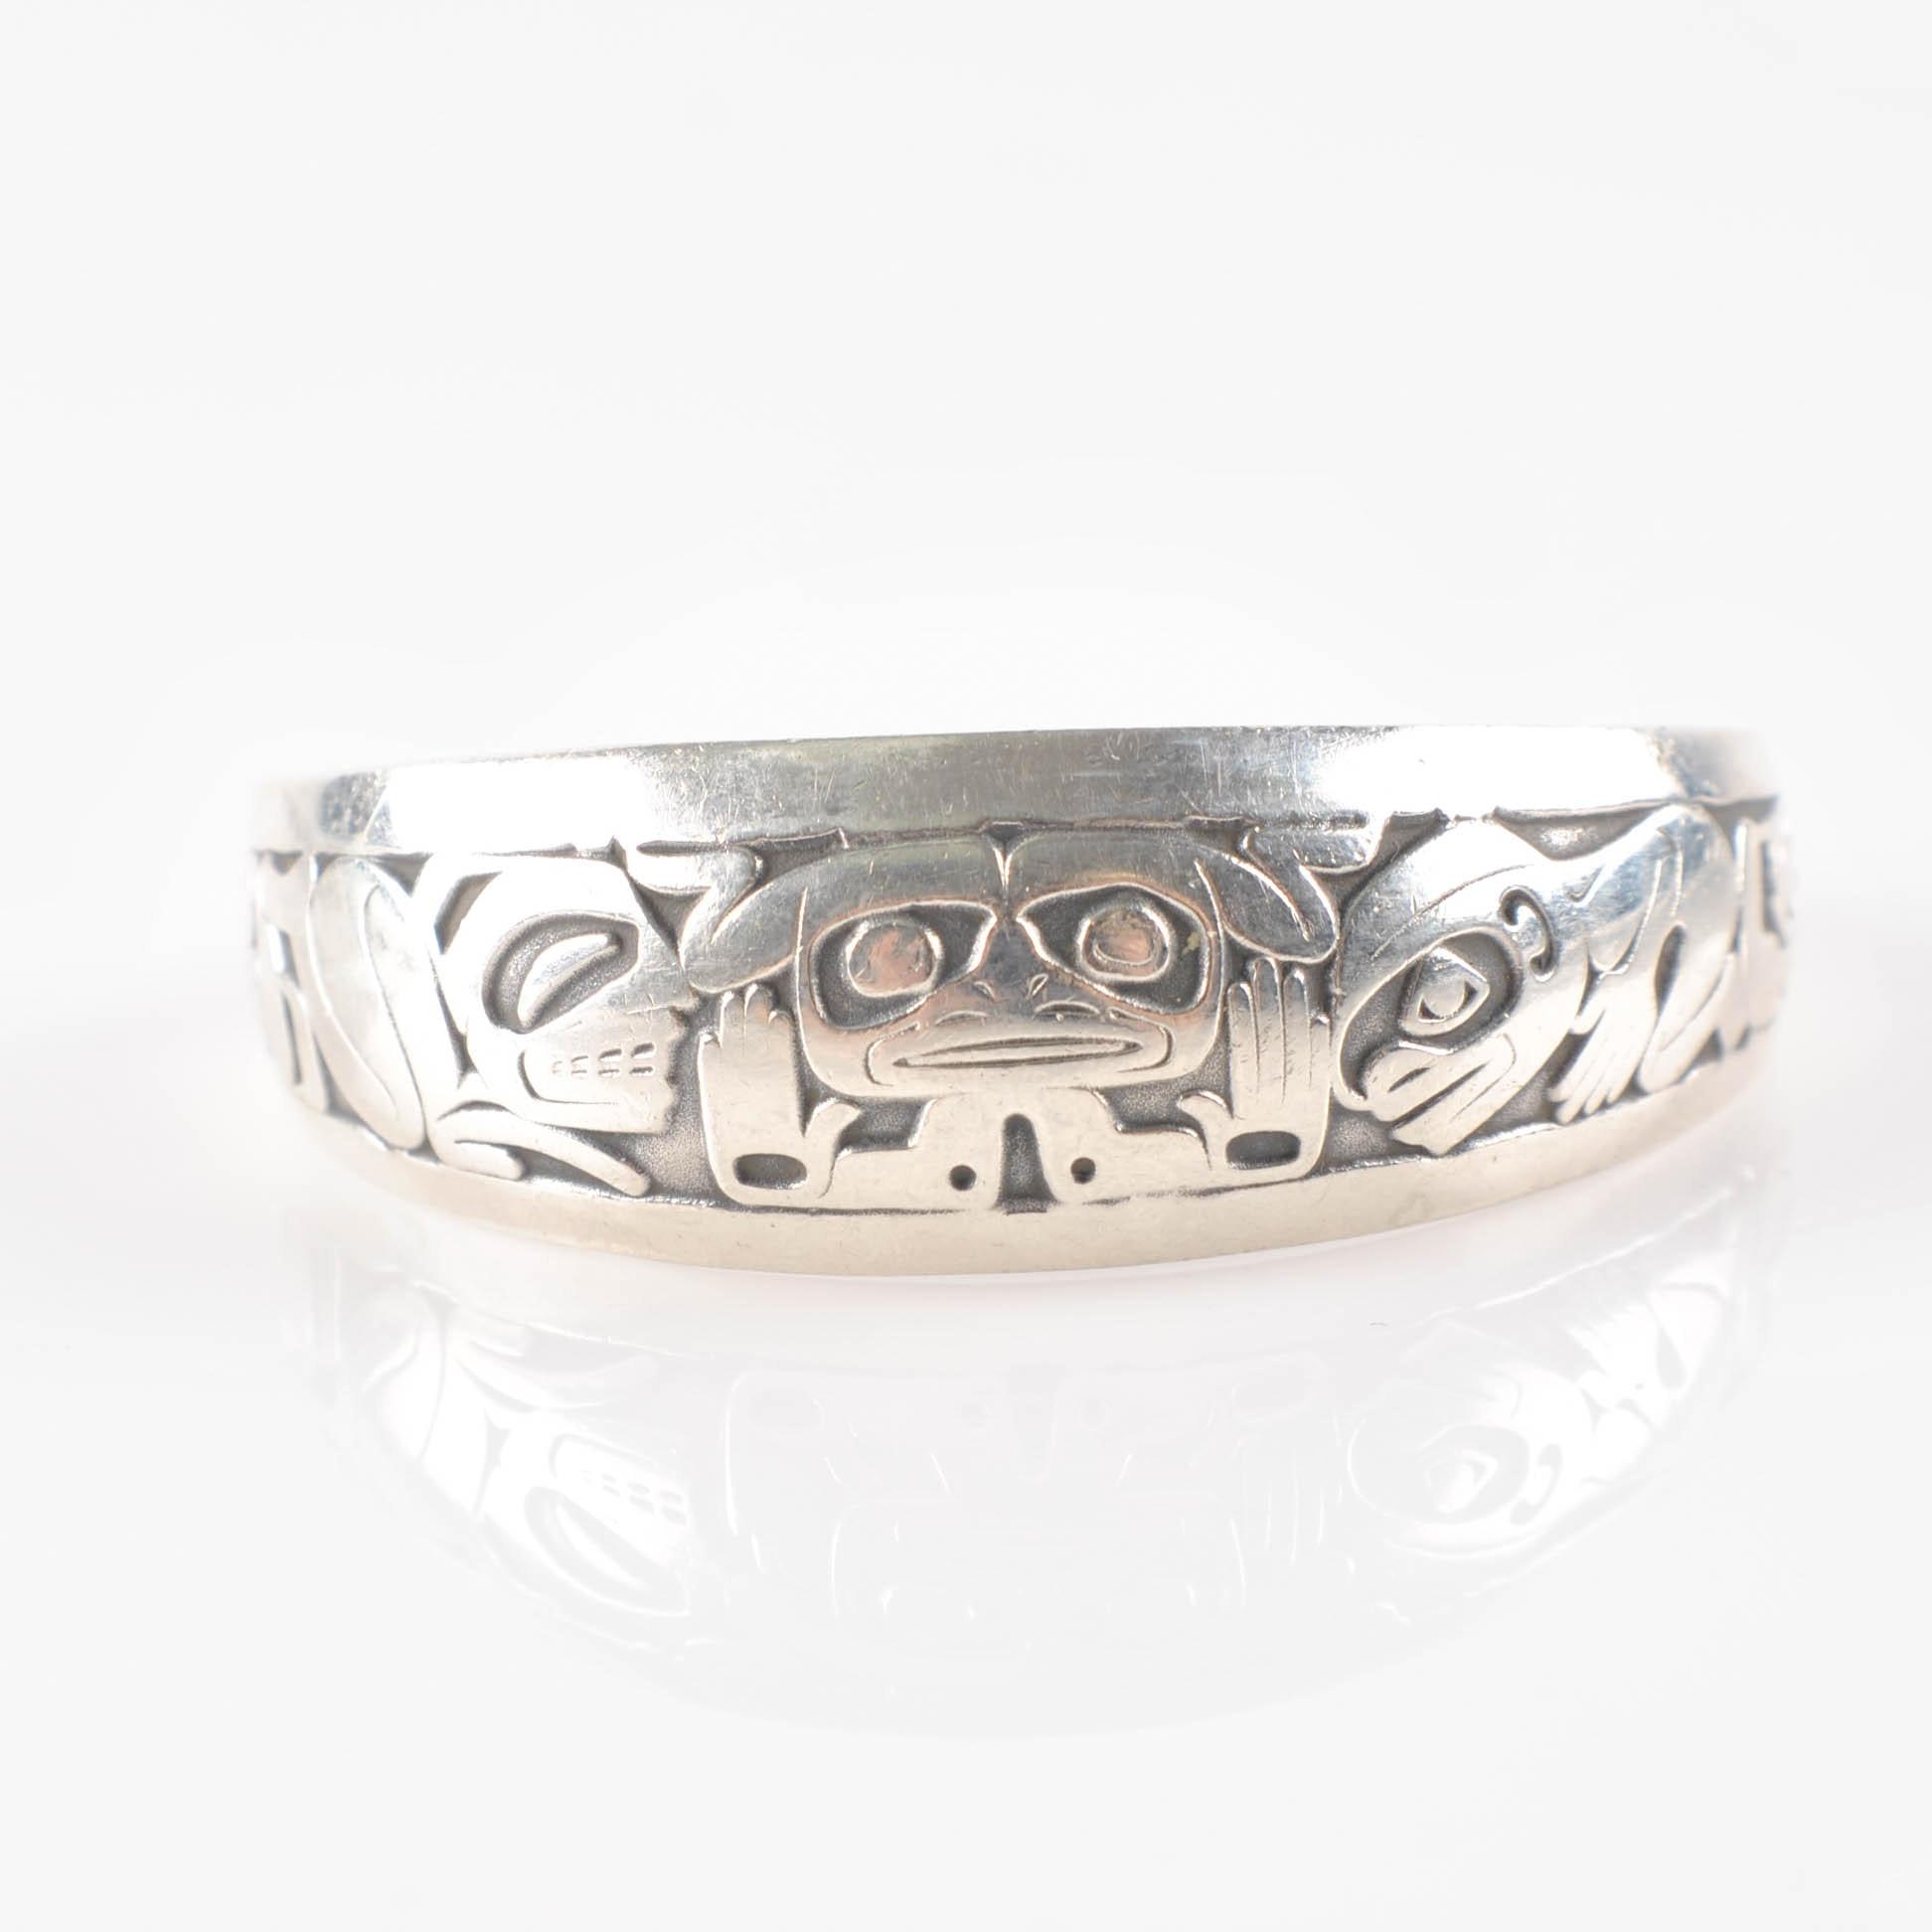 Vintage Barry Herem Sterling Pacific North West Emerging Mankind Cuff Bracelet